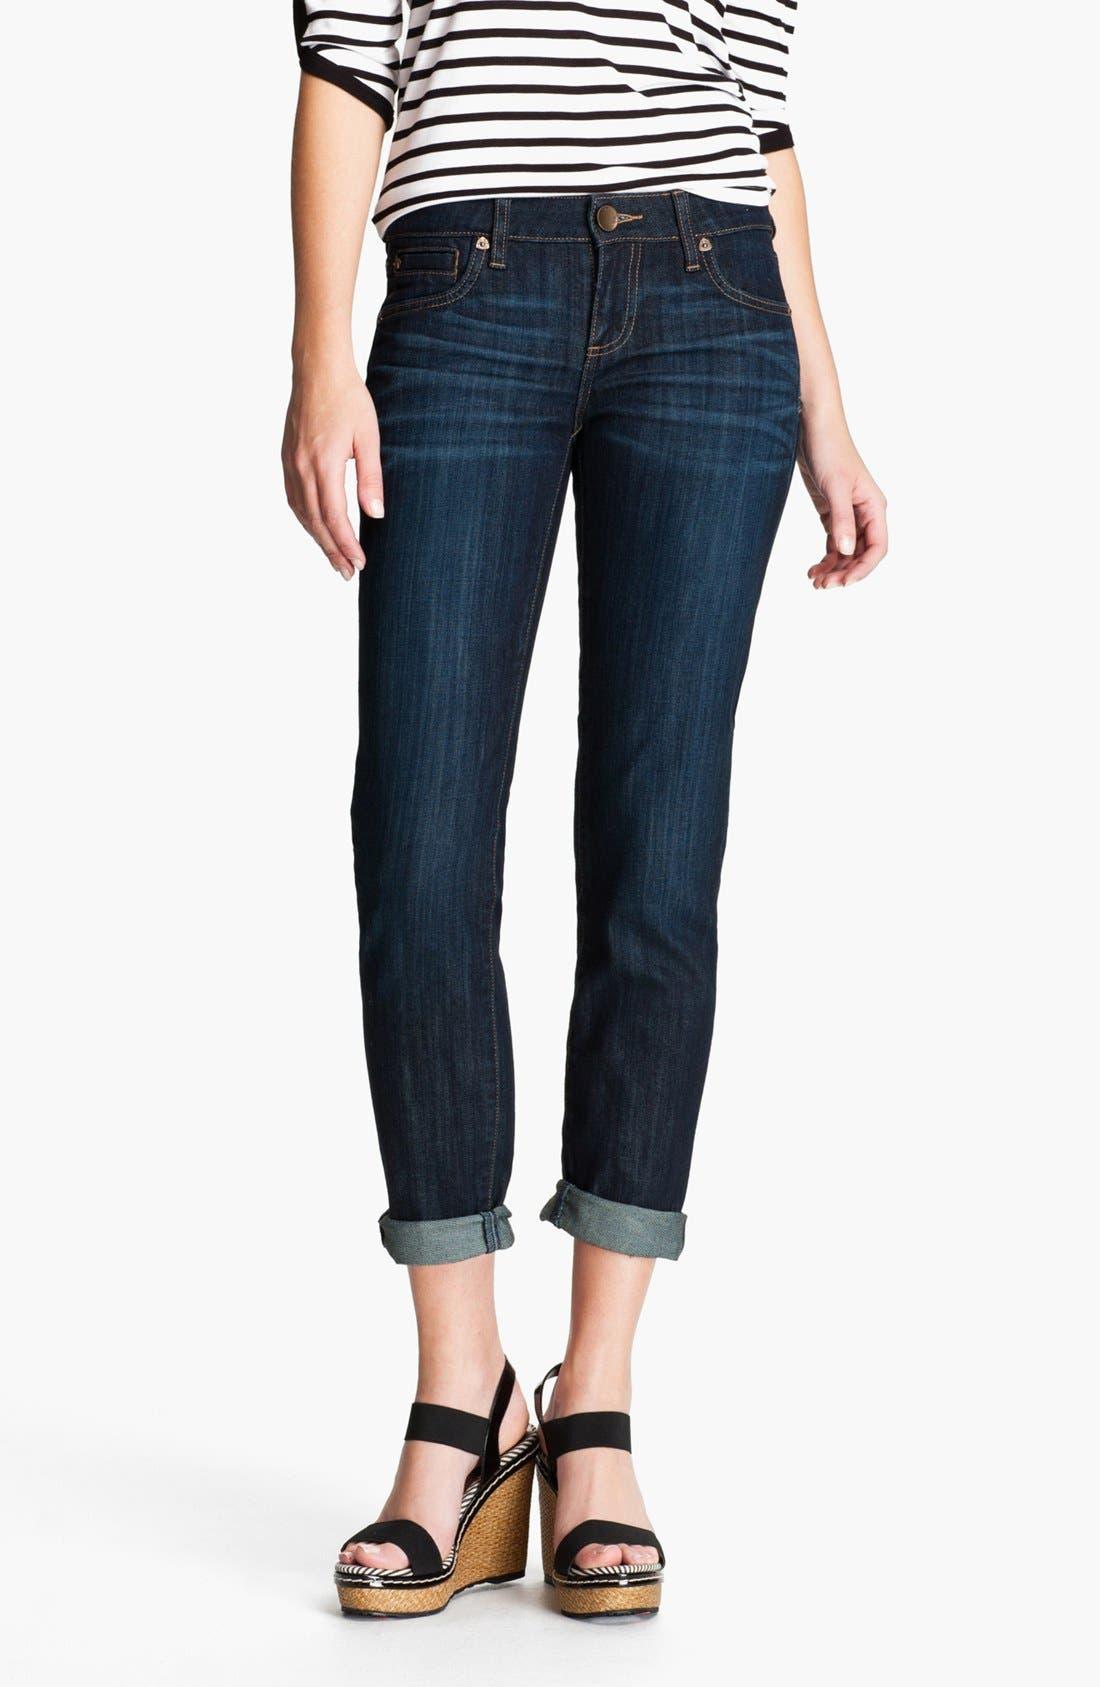 Alternate Image 1 Selected - KUT from the Kloth 'Catherine' Slim Boyfriend Jeans (Royal) (Regular & Petite)